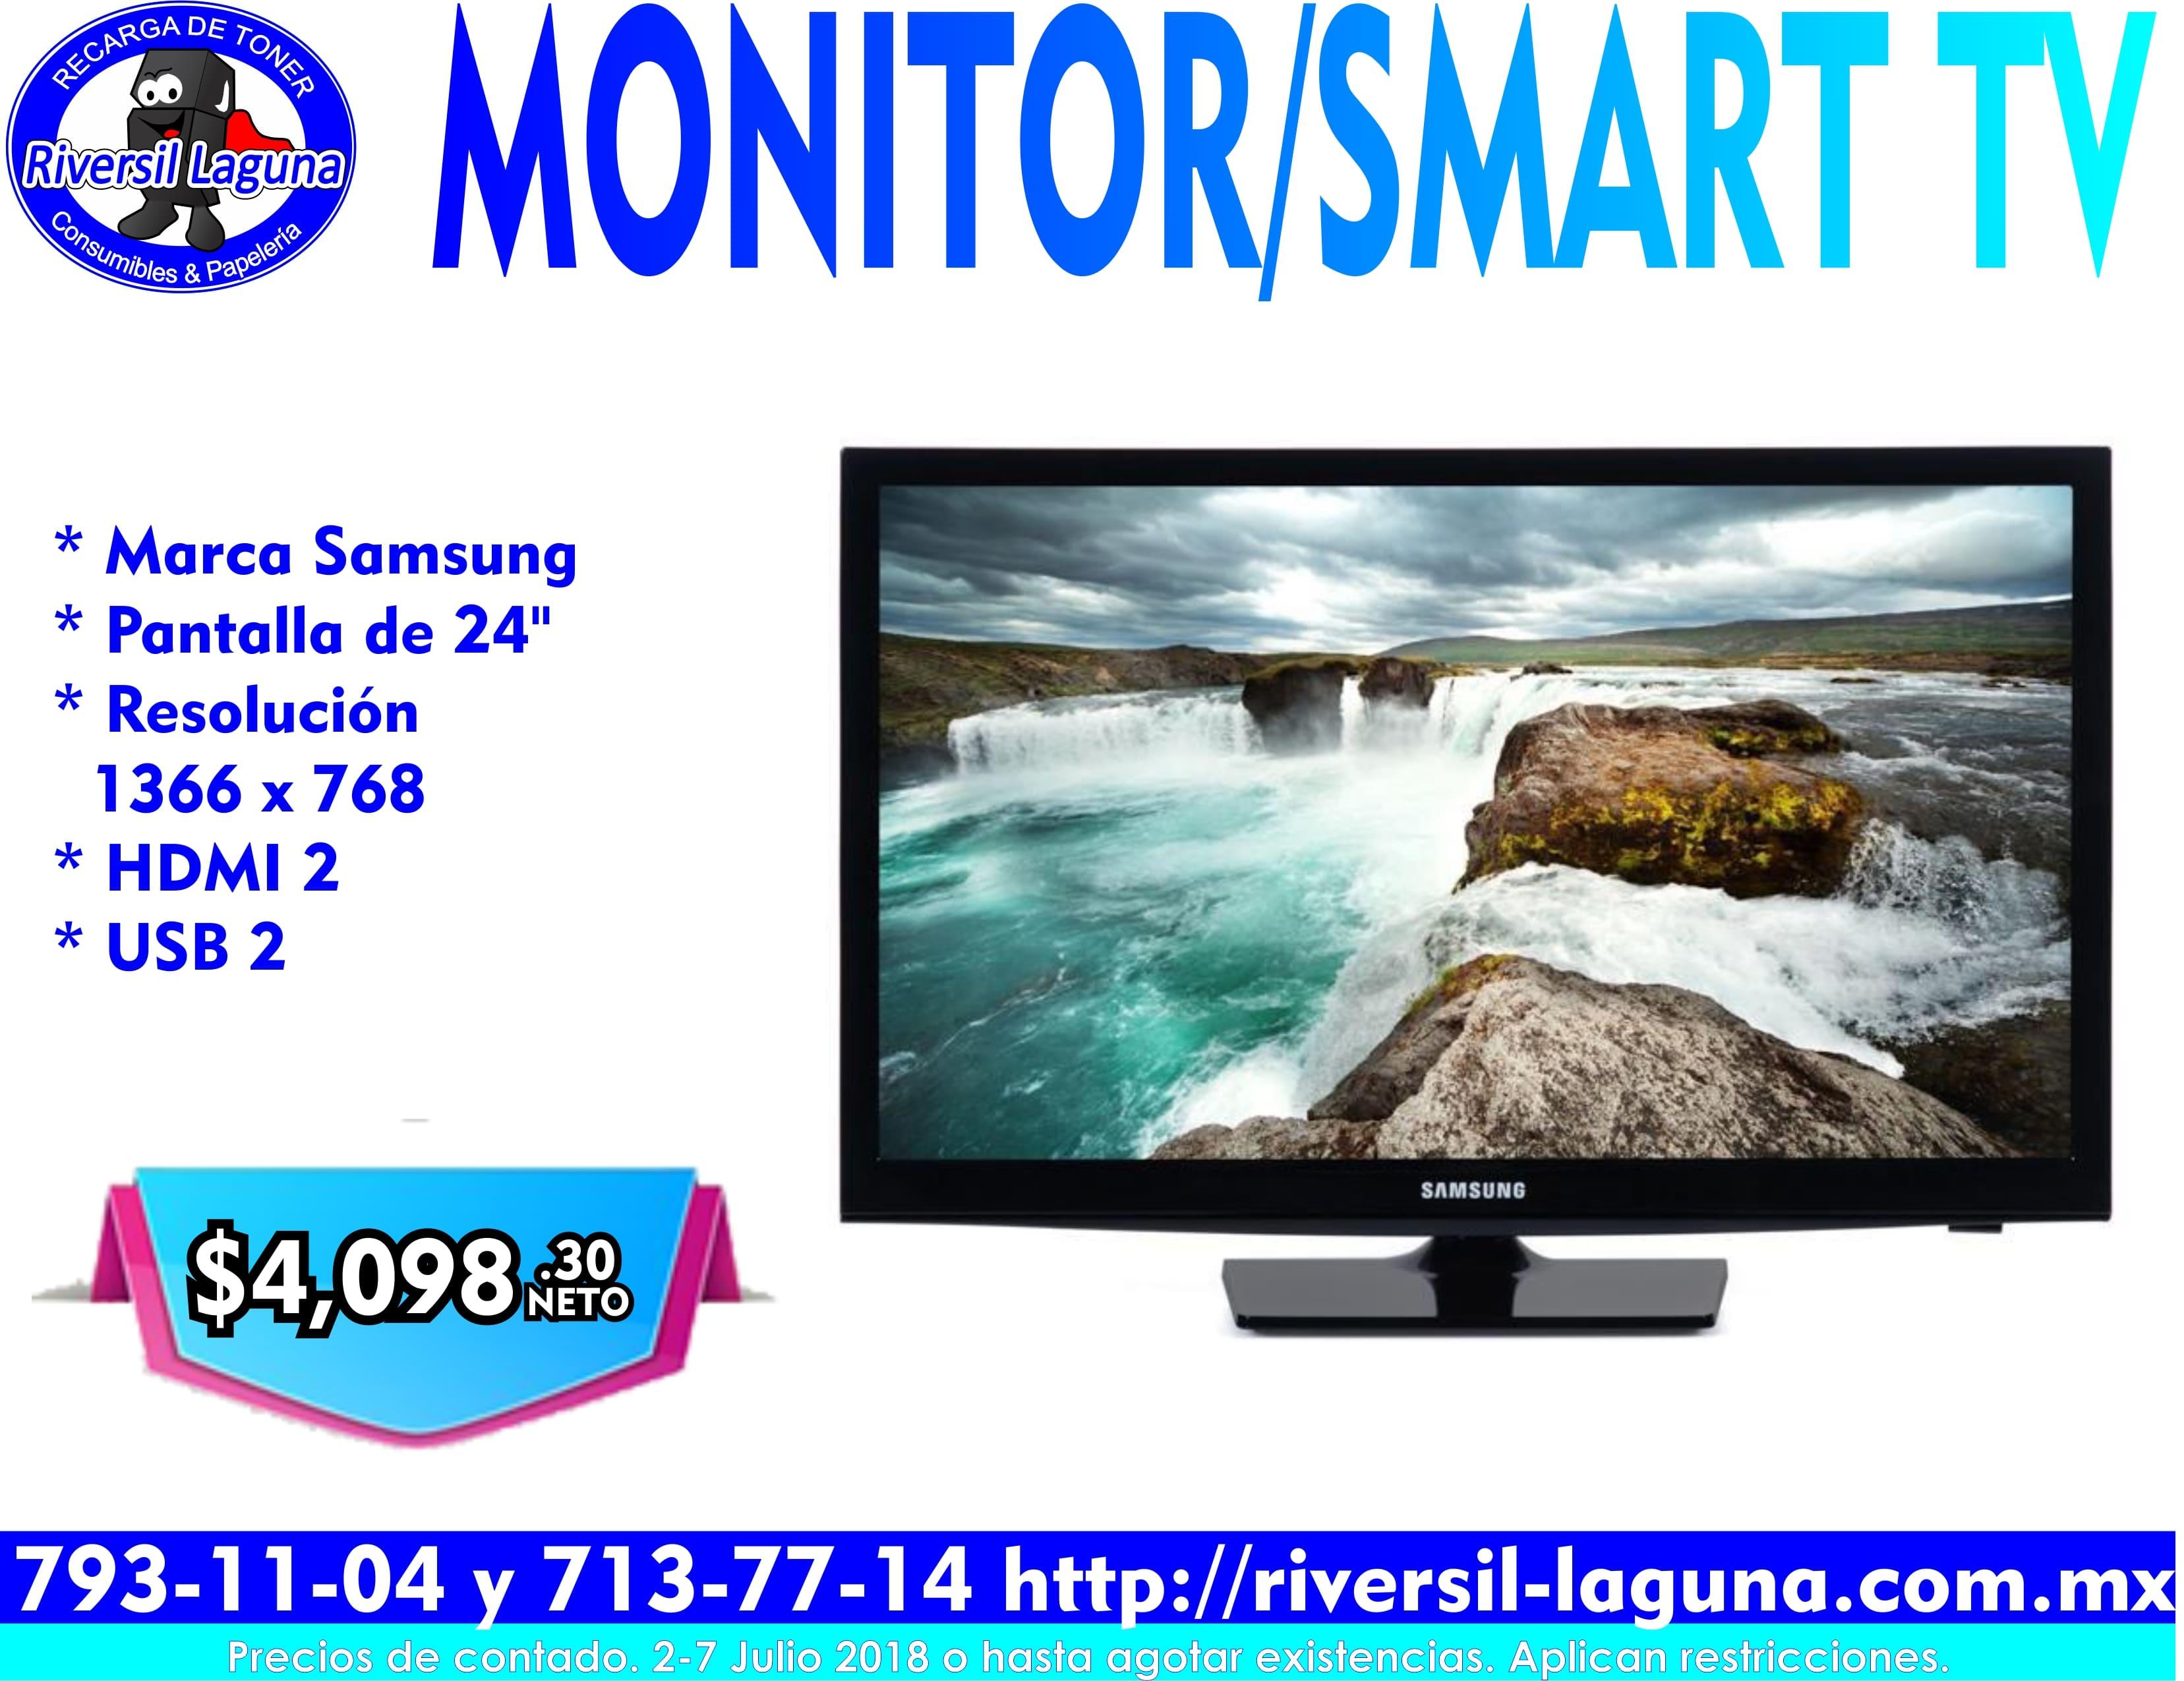 MONITOR/SMART TV SAMSUNG